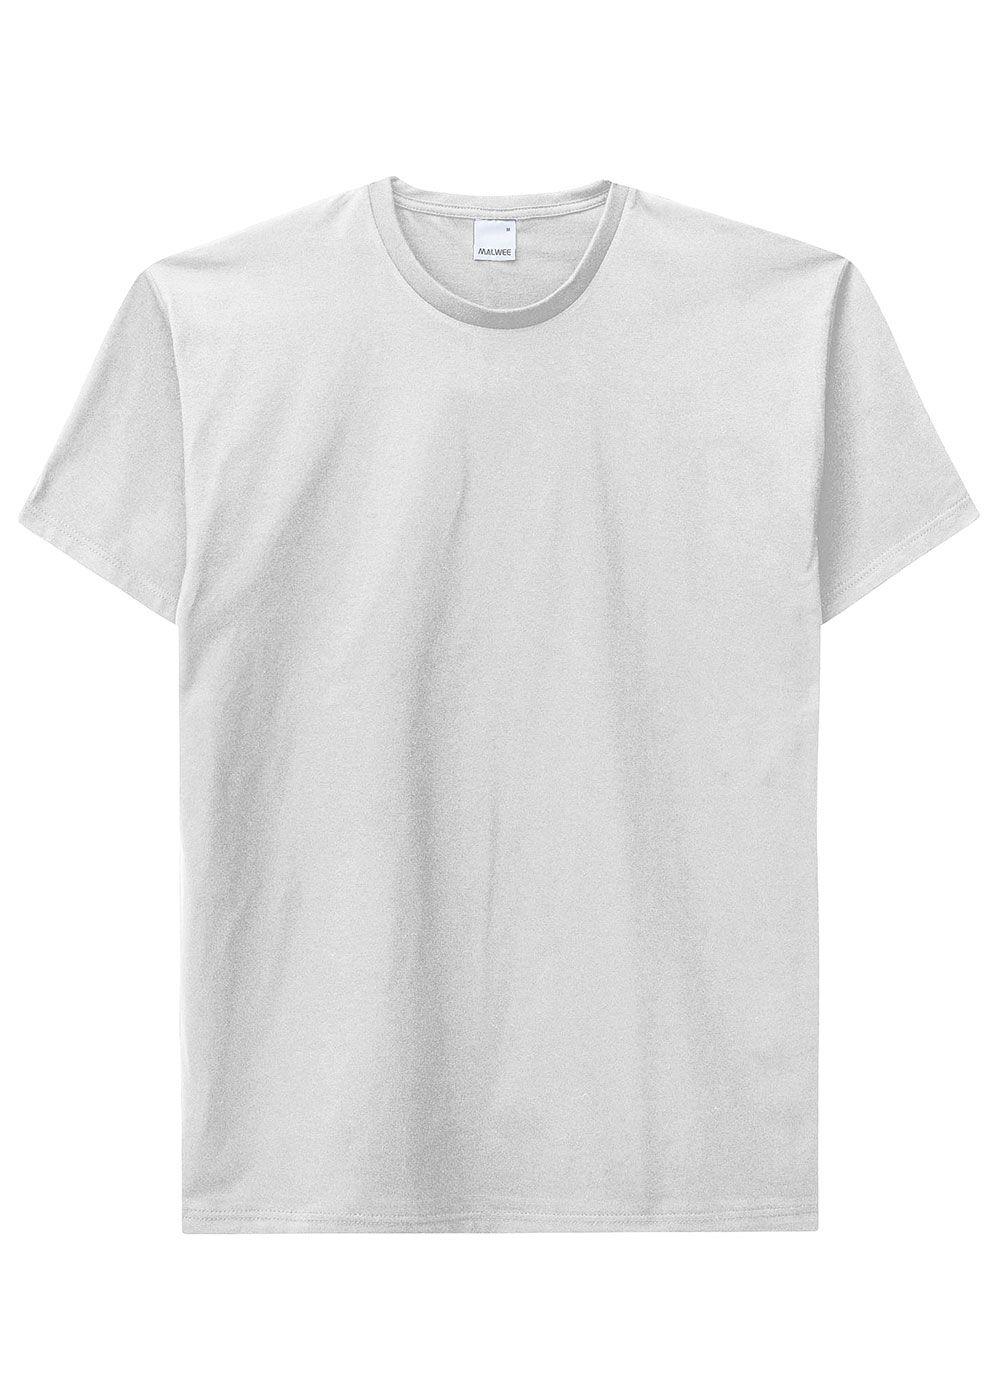 Camiseta Masculina ADULTO Branca Malwee